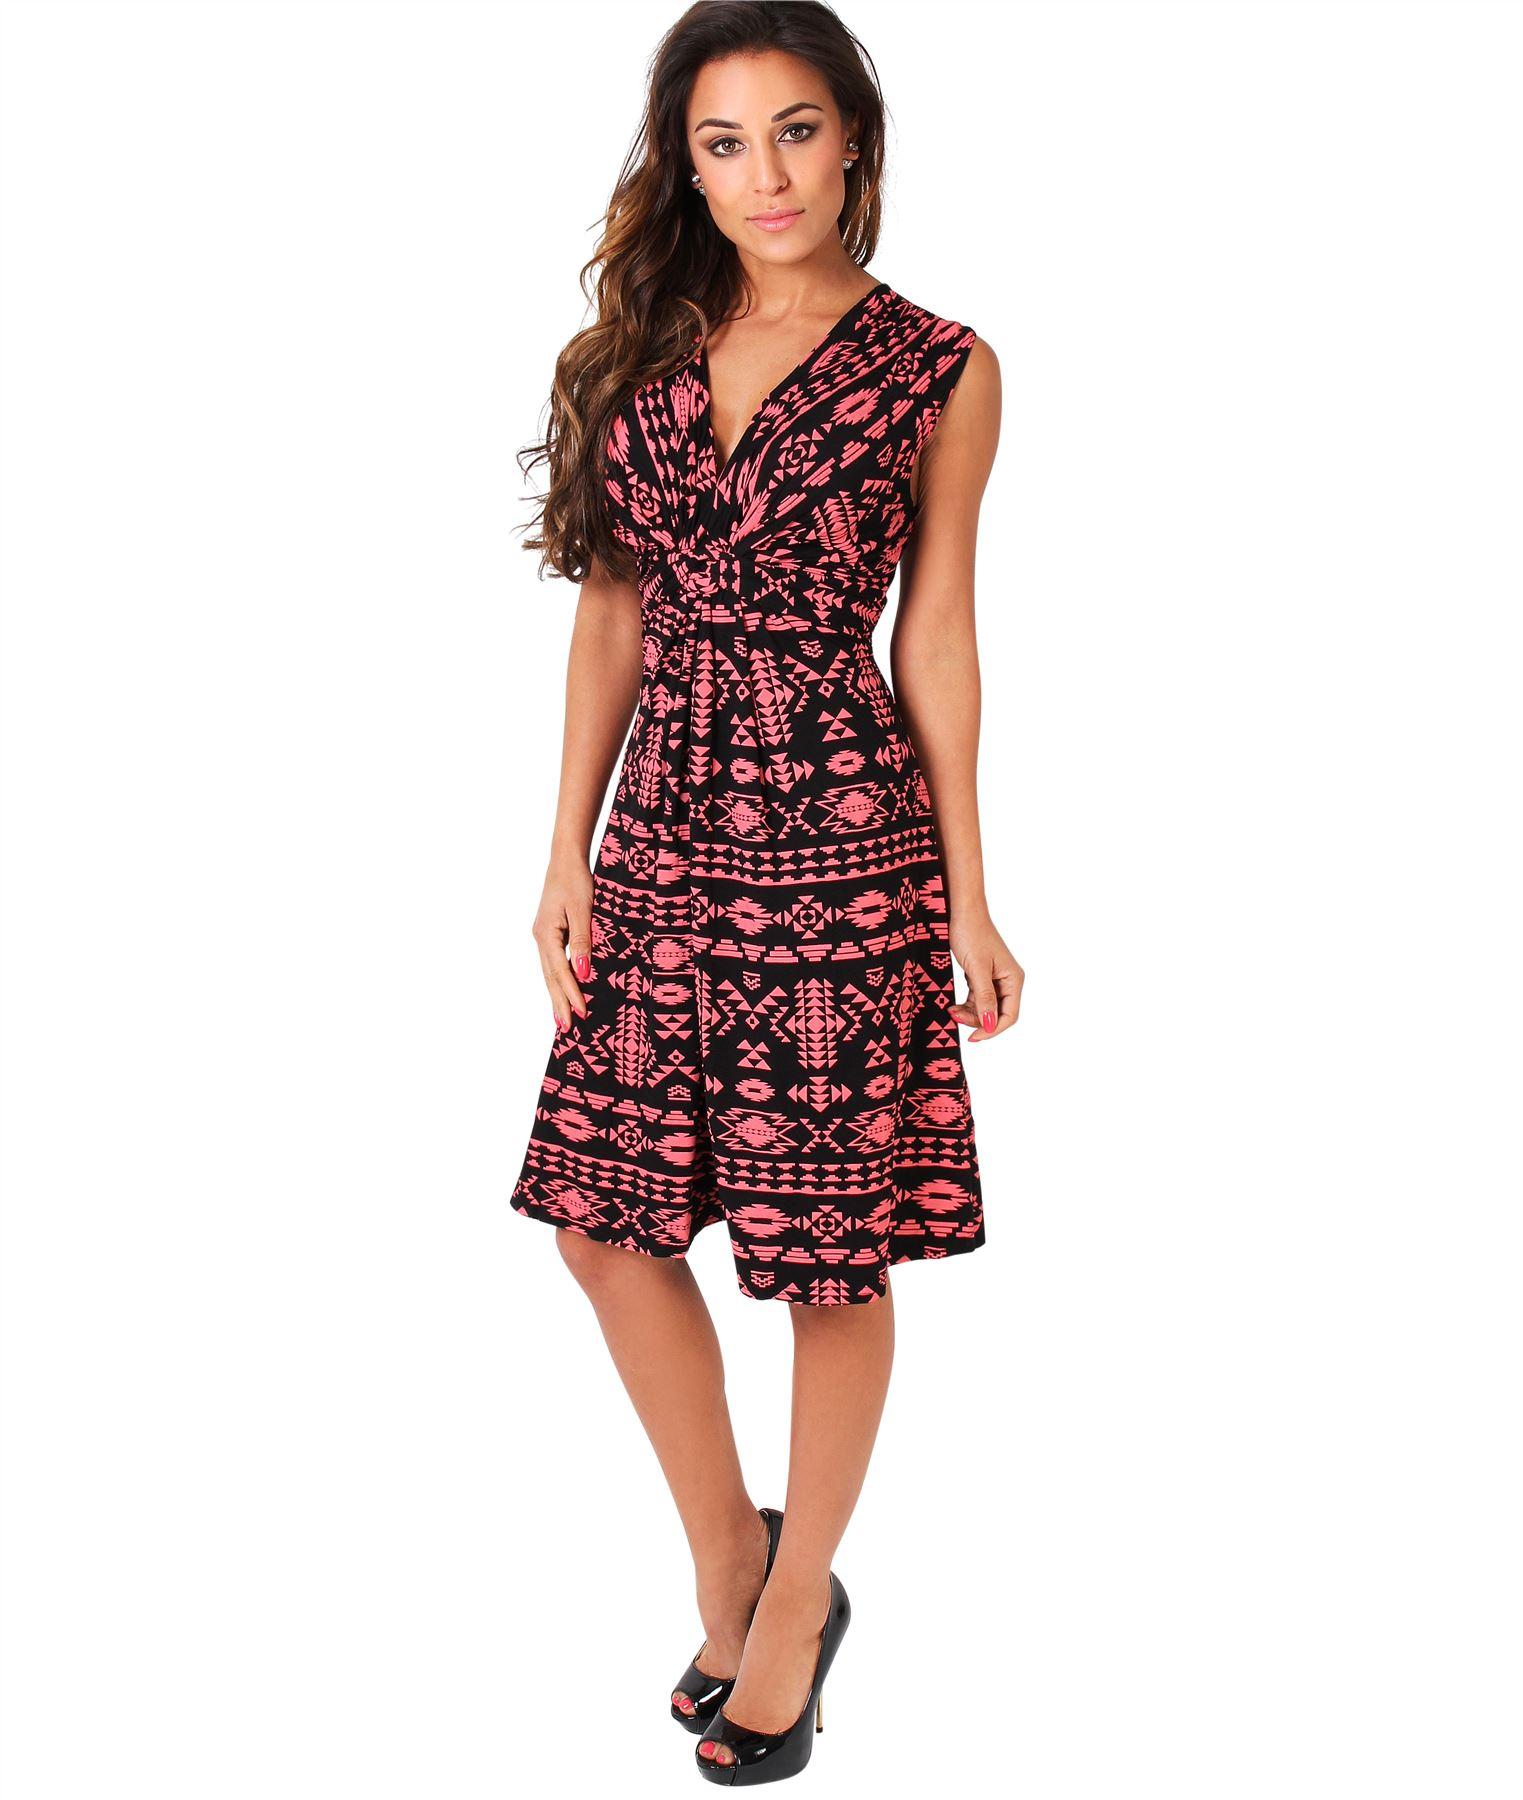 Womens-V-Neck-Mini-Dress-Small-Sizes-Short-Skirt-Tribal-Print-Front-Knot-Party thumbnail 3